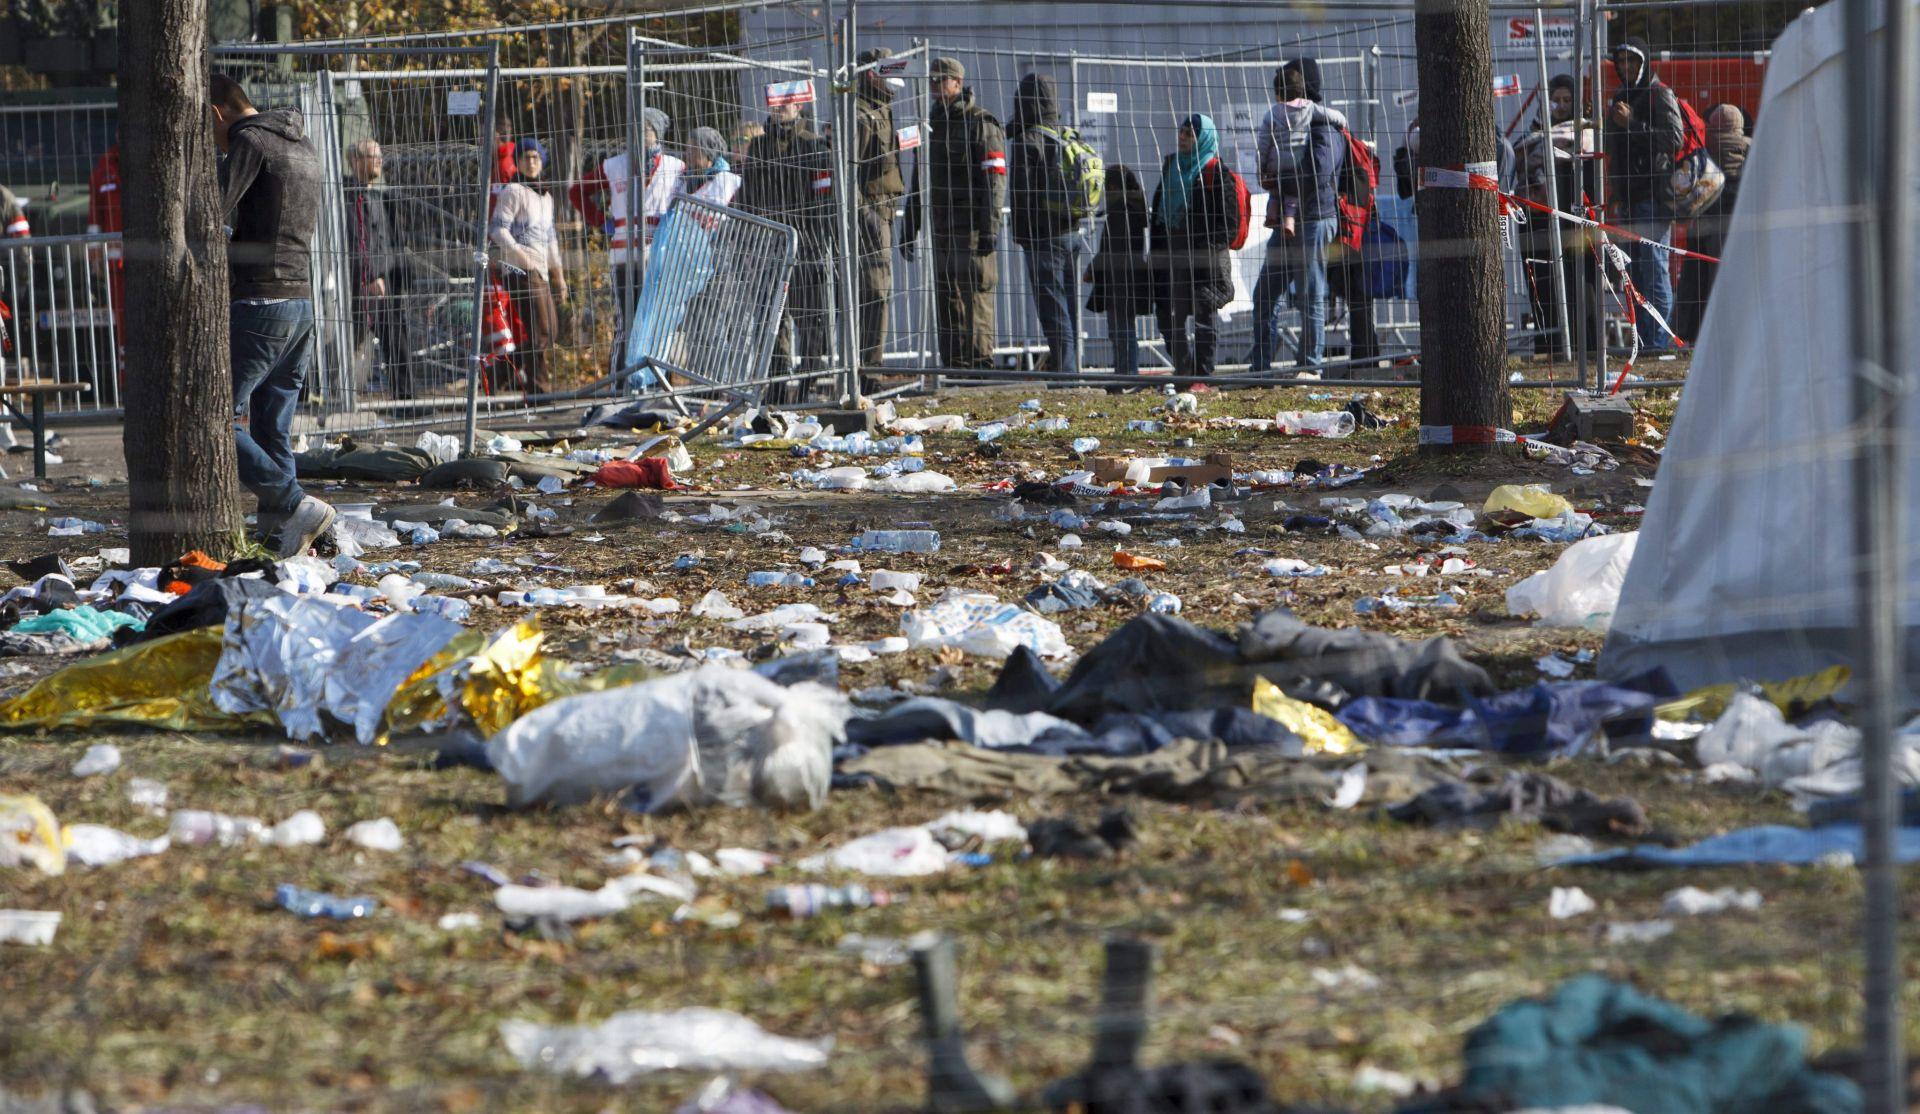 Slovenija: Izbjeglički centri prazni, strah od velikog priljeva sredinom tjedna